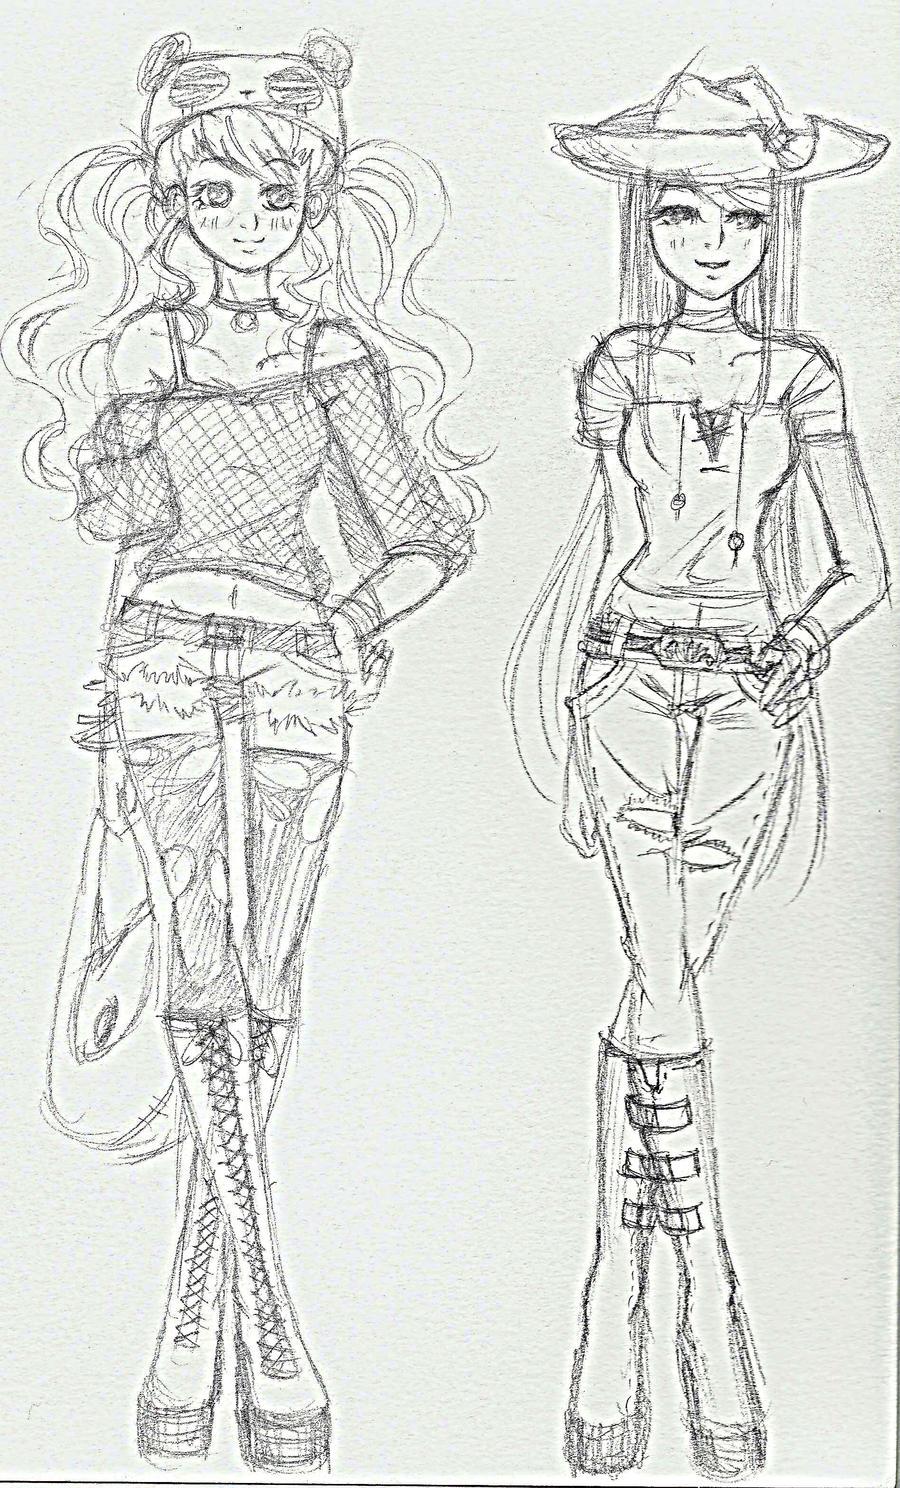 Just for fun fashion doodles - incomplete by missmiakomyori